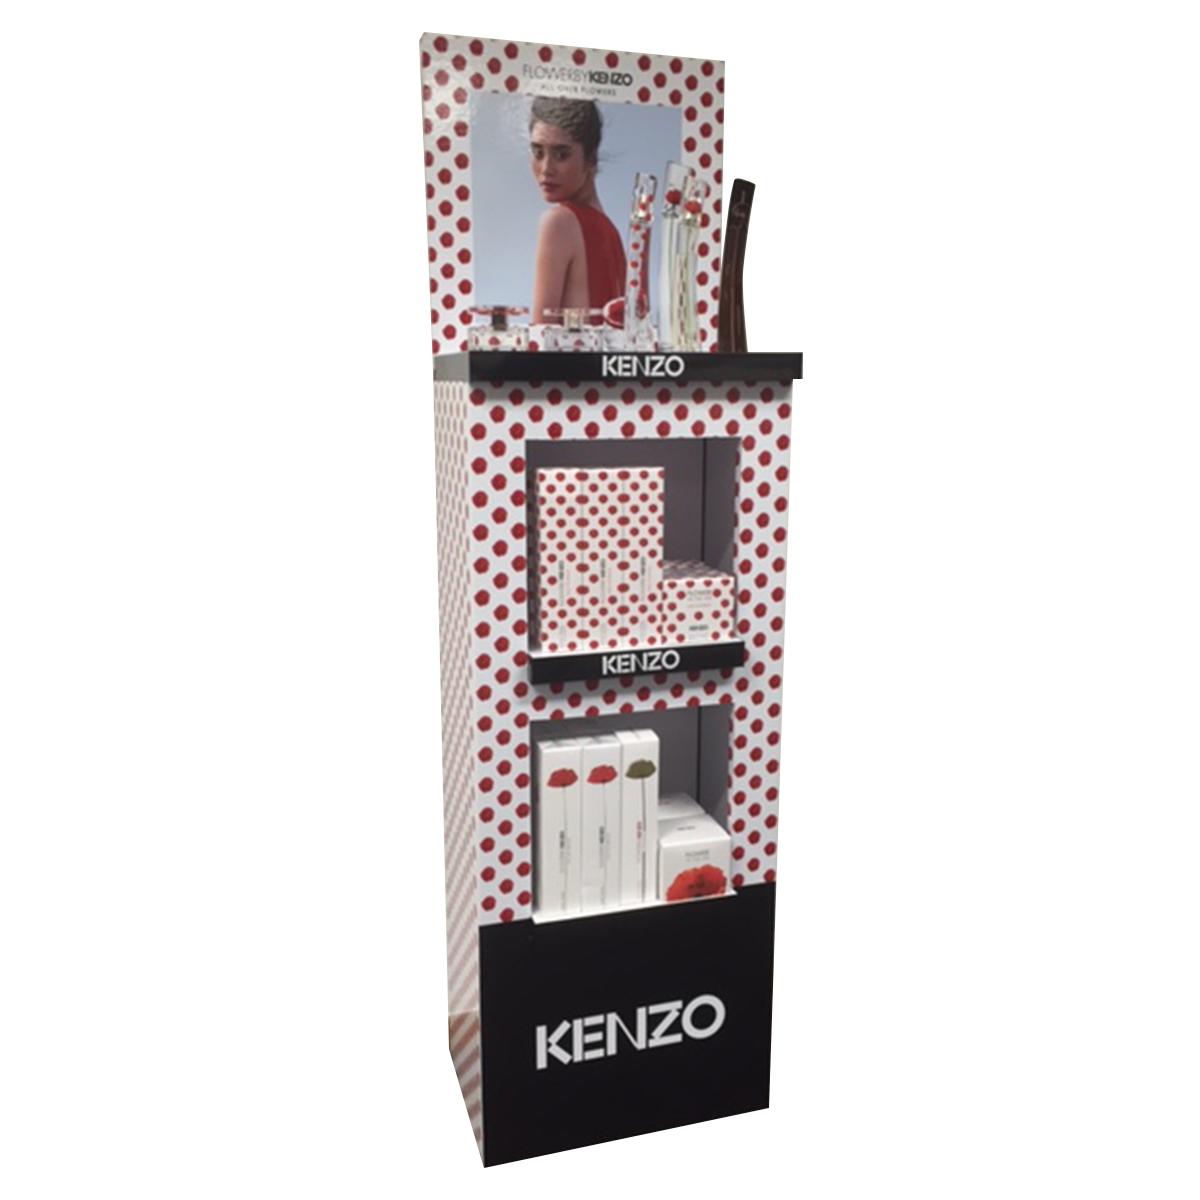 Display-KENZOFLOWER-Stocker